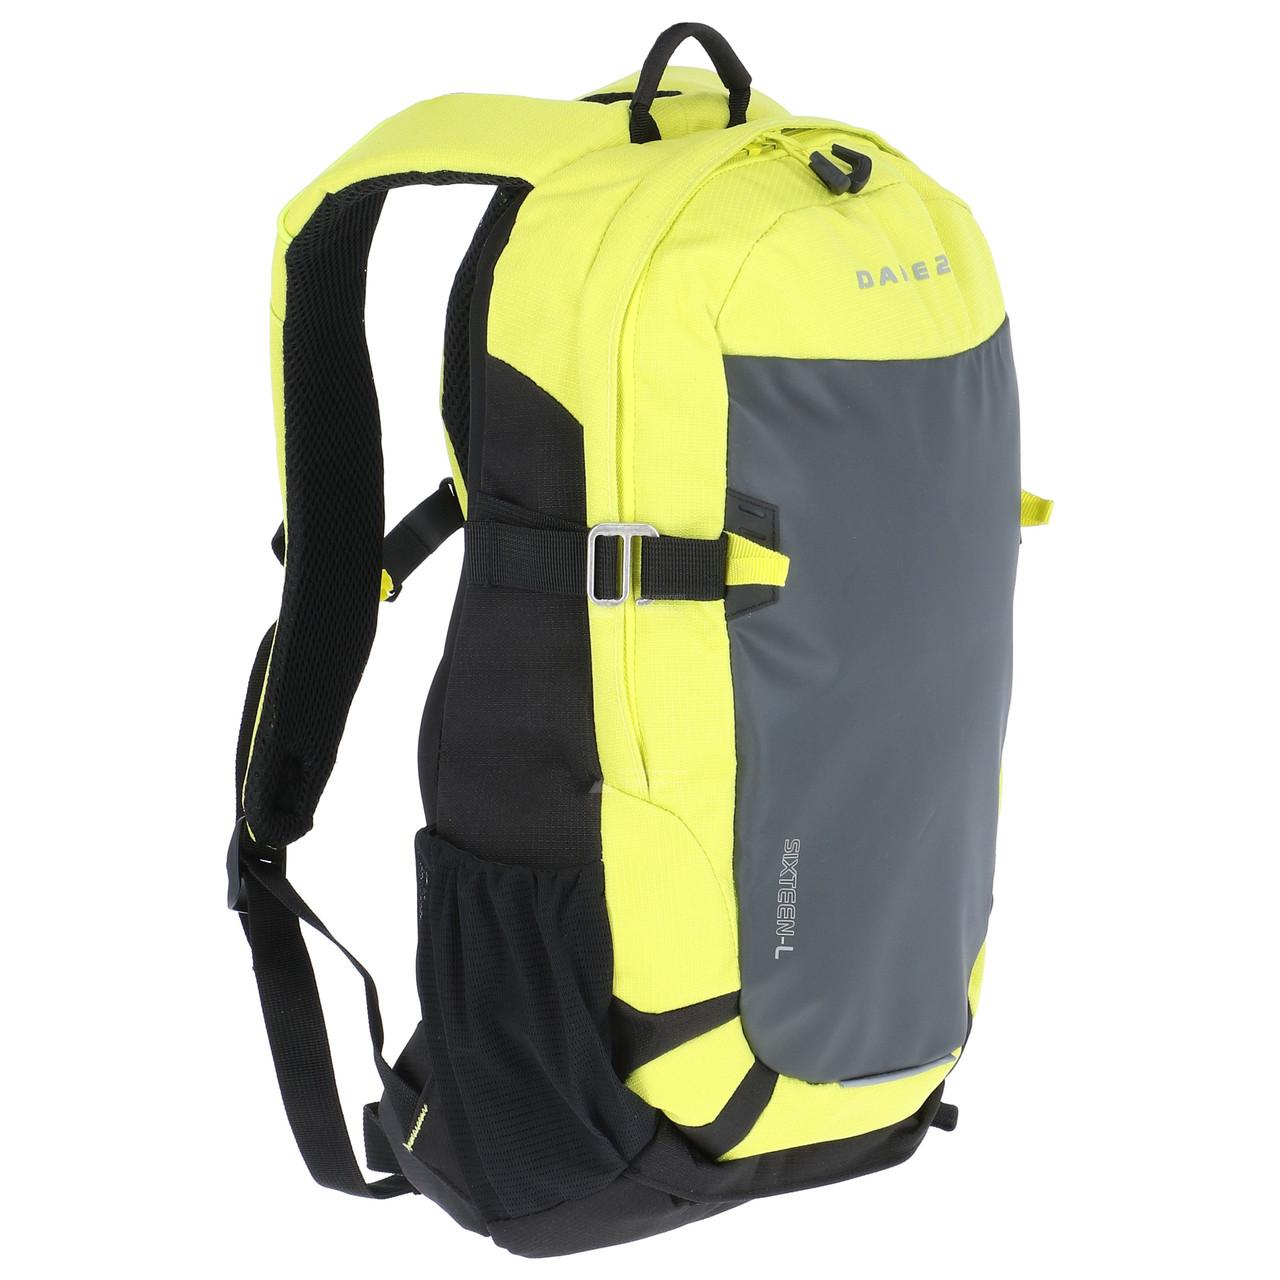 Рюкзак Regatta Kros 16 DUE342 Yellow-Black - Оригинал